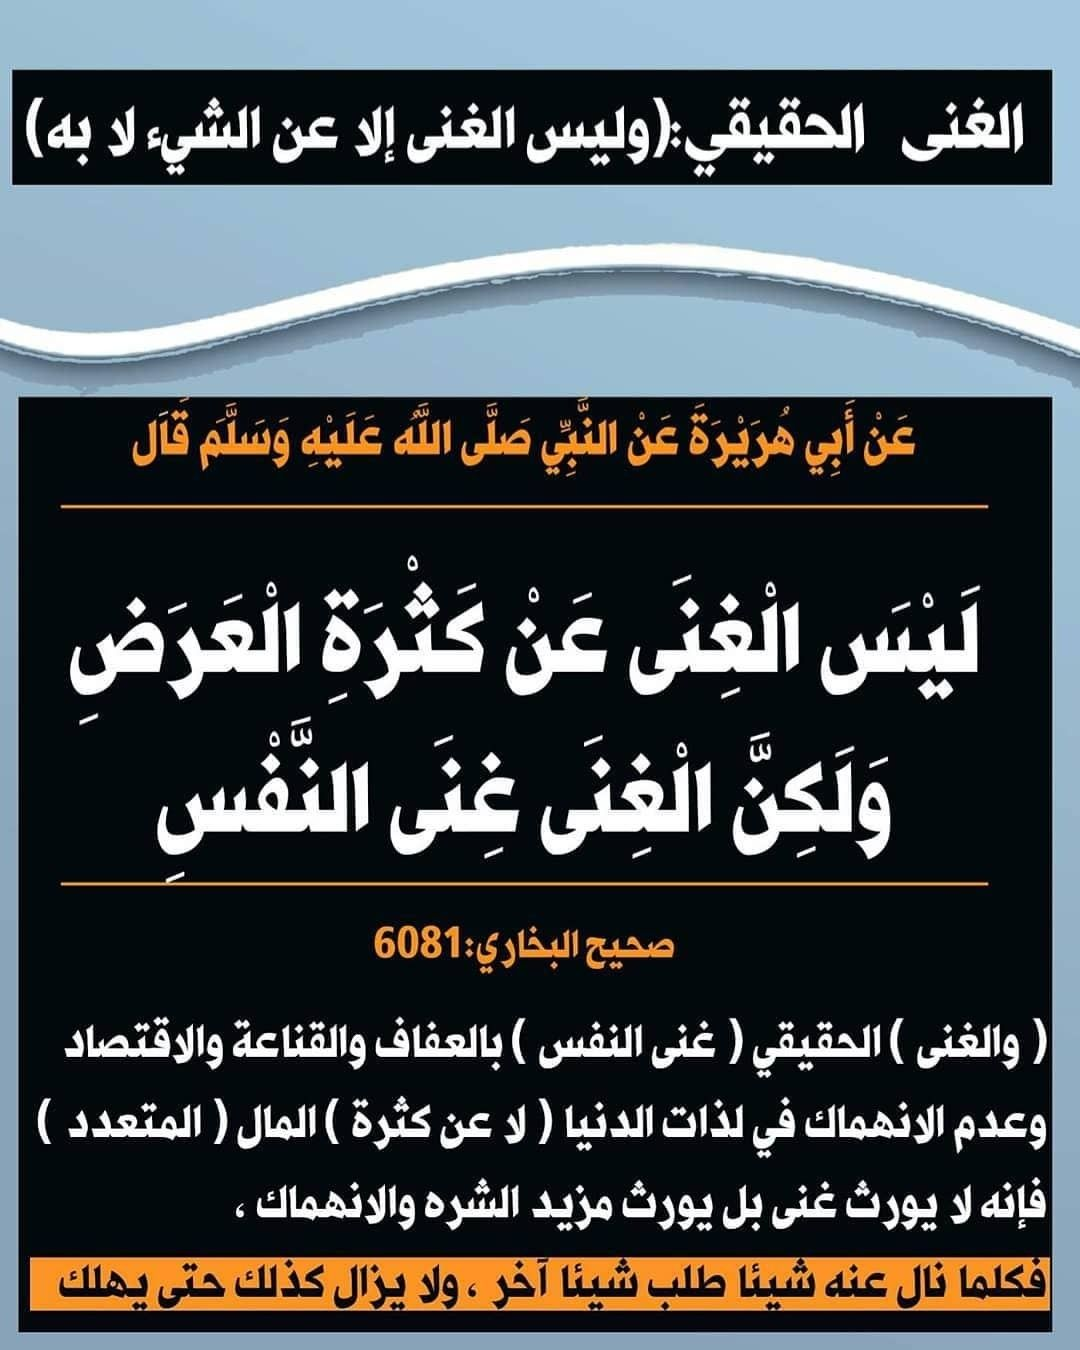 Pin By عبق الورد On أحاديث نبوية ١ Words Quotes Islamic Quotes Wisdom